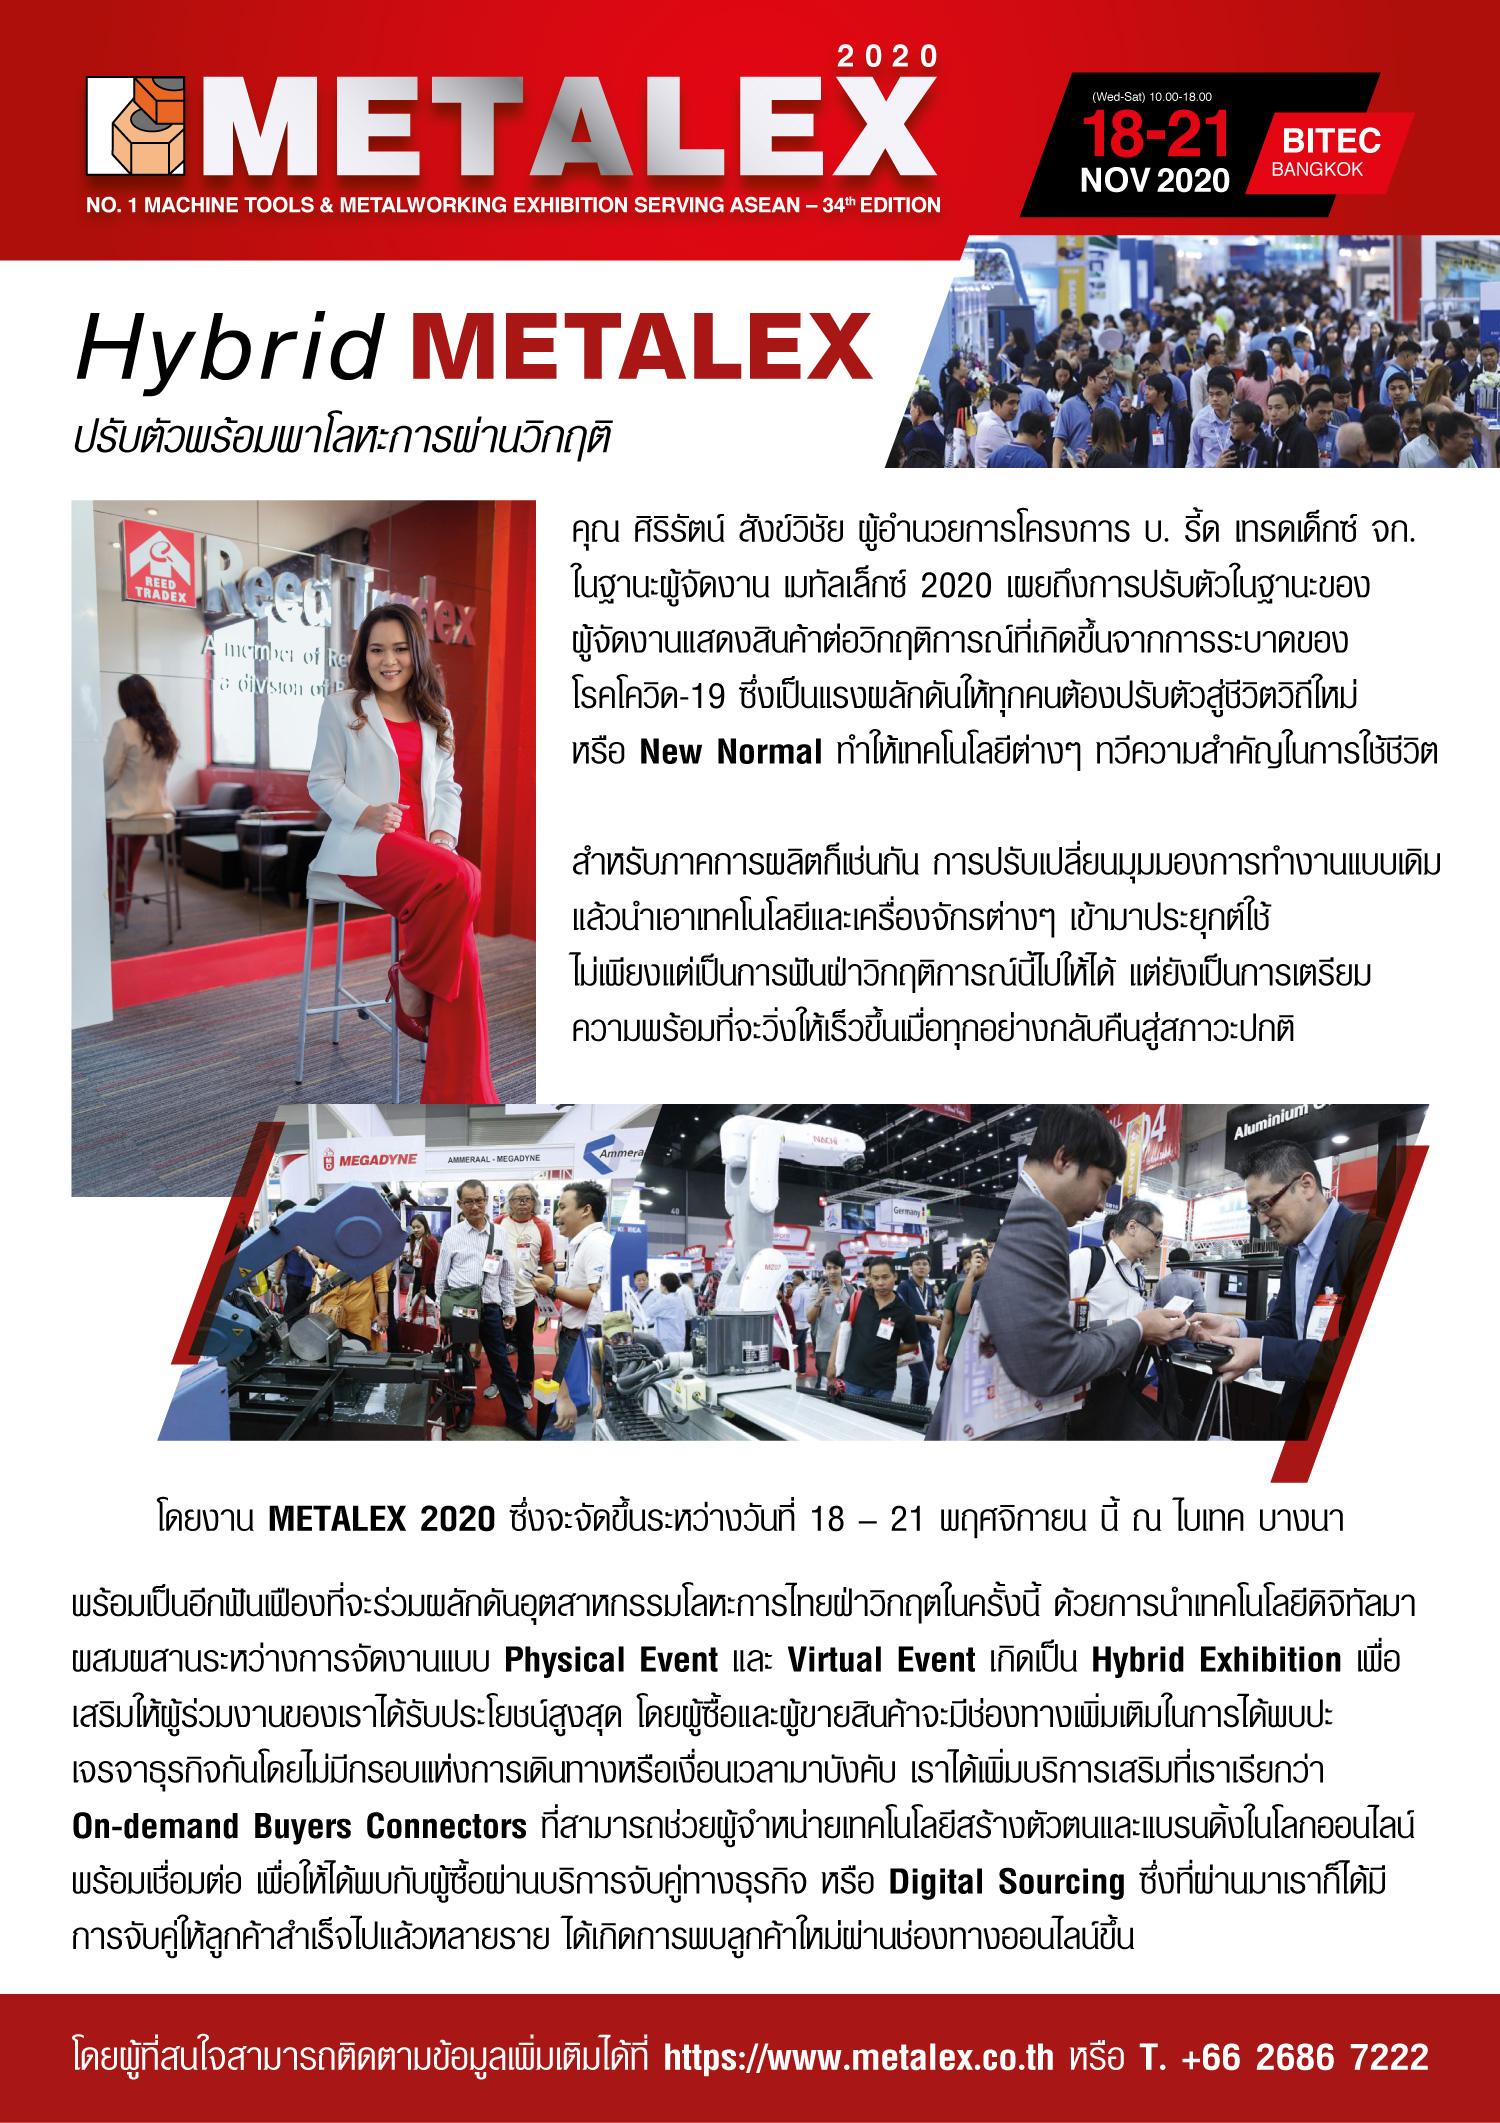 METALEX 2020 ซึ่งจะจัดขึ้น ระหว่างวันที่ 18 – 21 พฤศจิกายน นี้ ณ ไบเทค บางนา